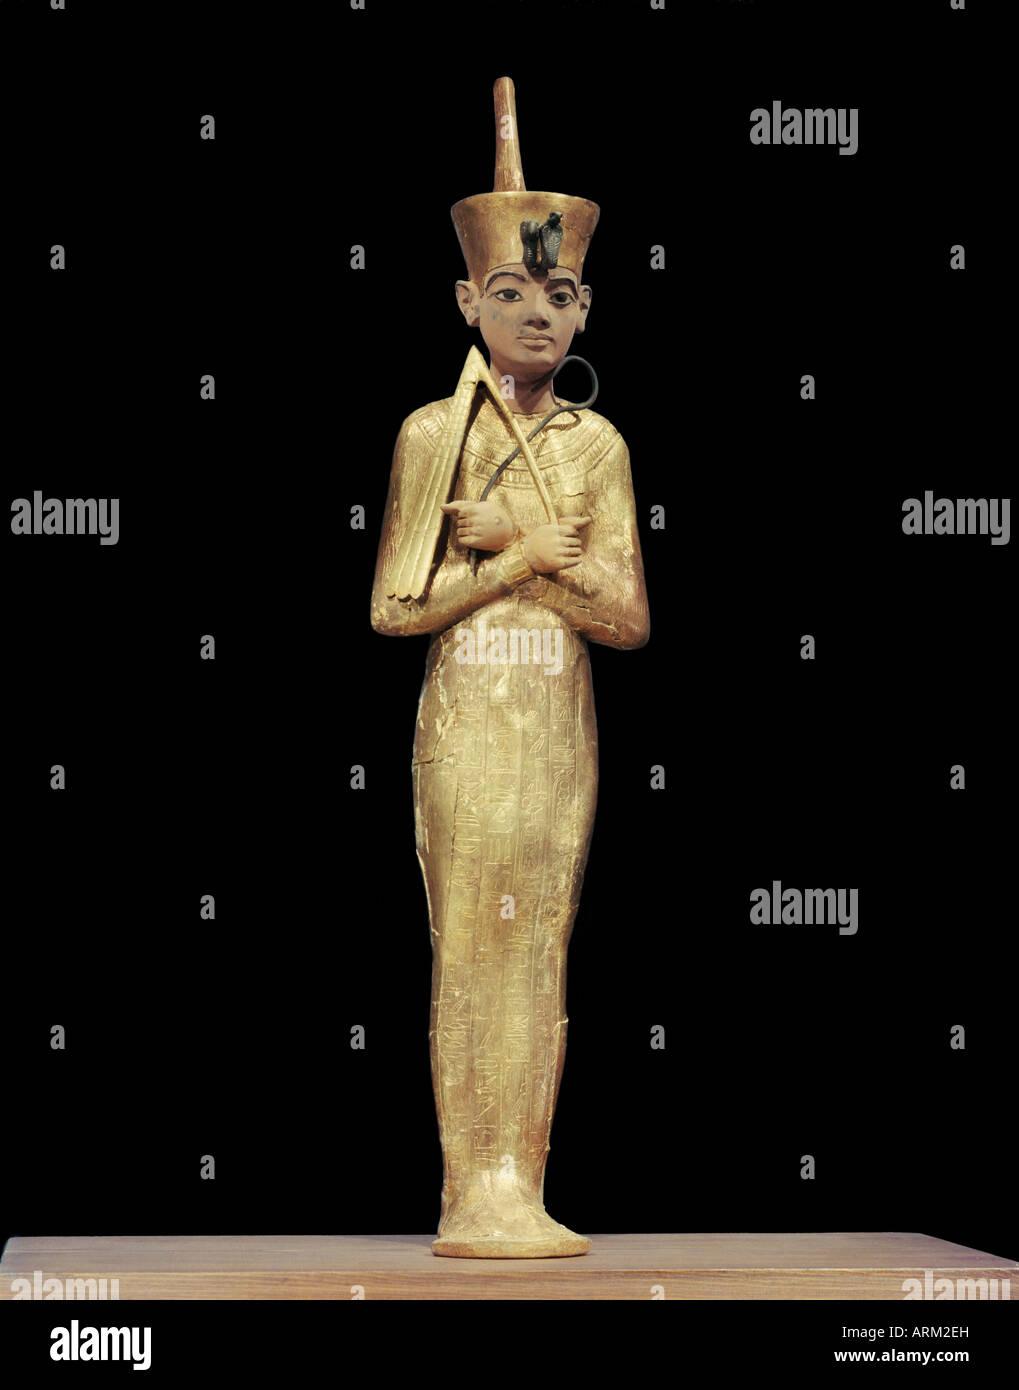 Ushabti of Tutankhamun, showning king wearing the red crown of the North, from the tomb of the pharaoh Tutankhamun - Stock Image